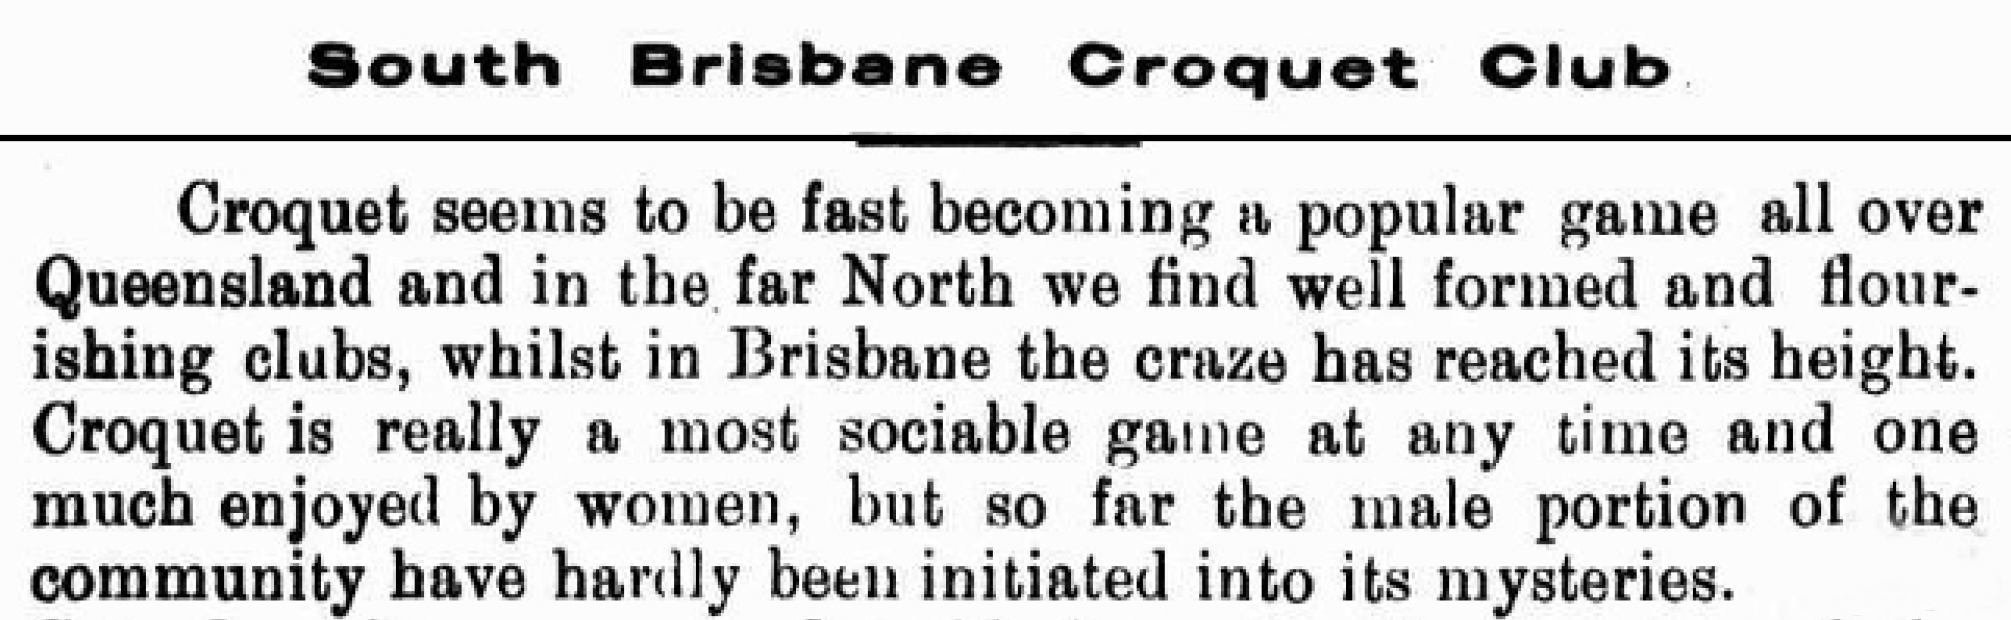 Queensland Figaro (Brisbane, Qld. : 1901 - 1936), Thursday 18 Ju